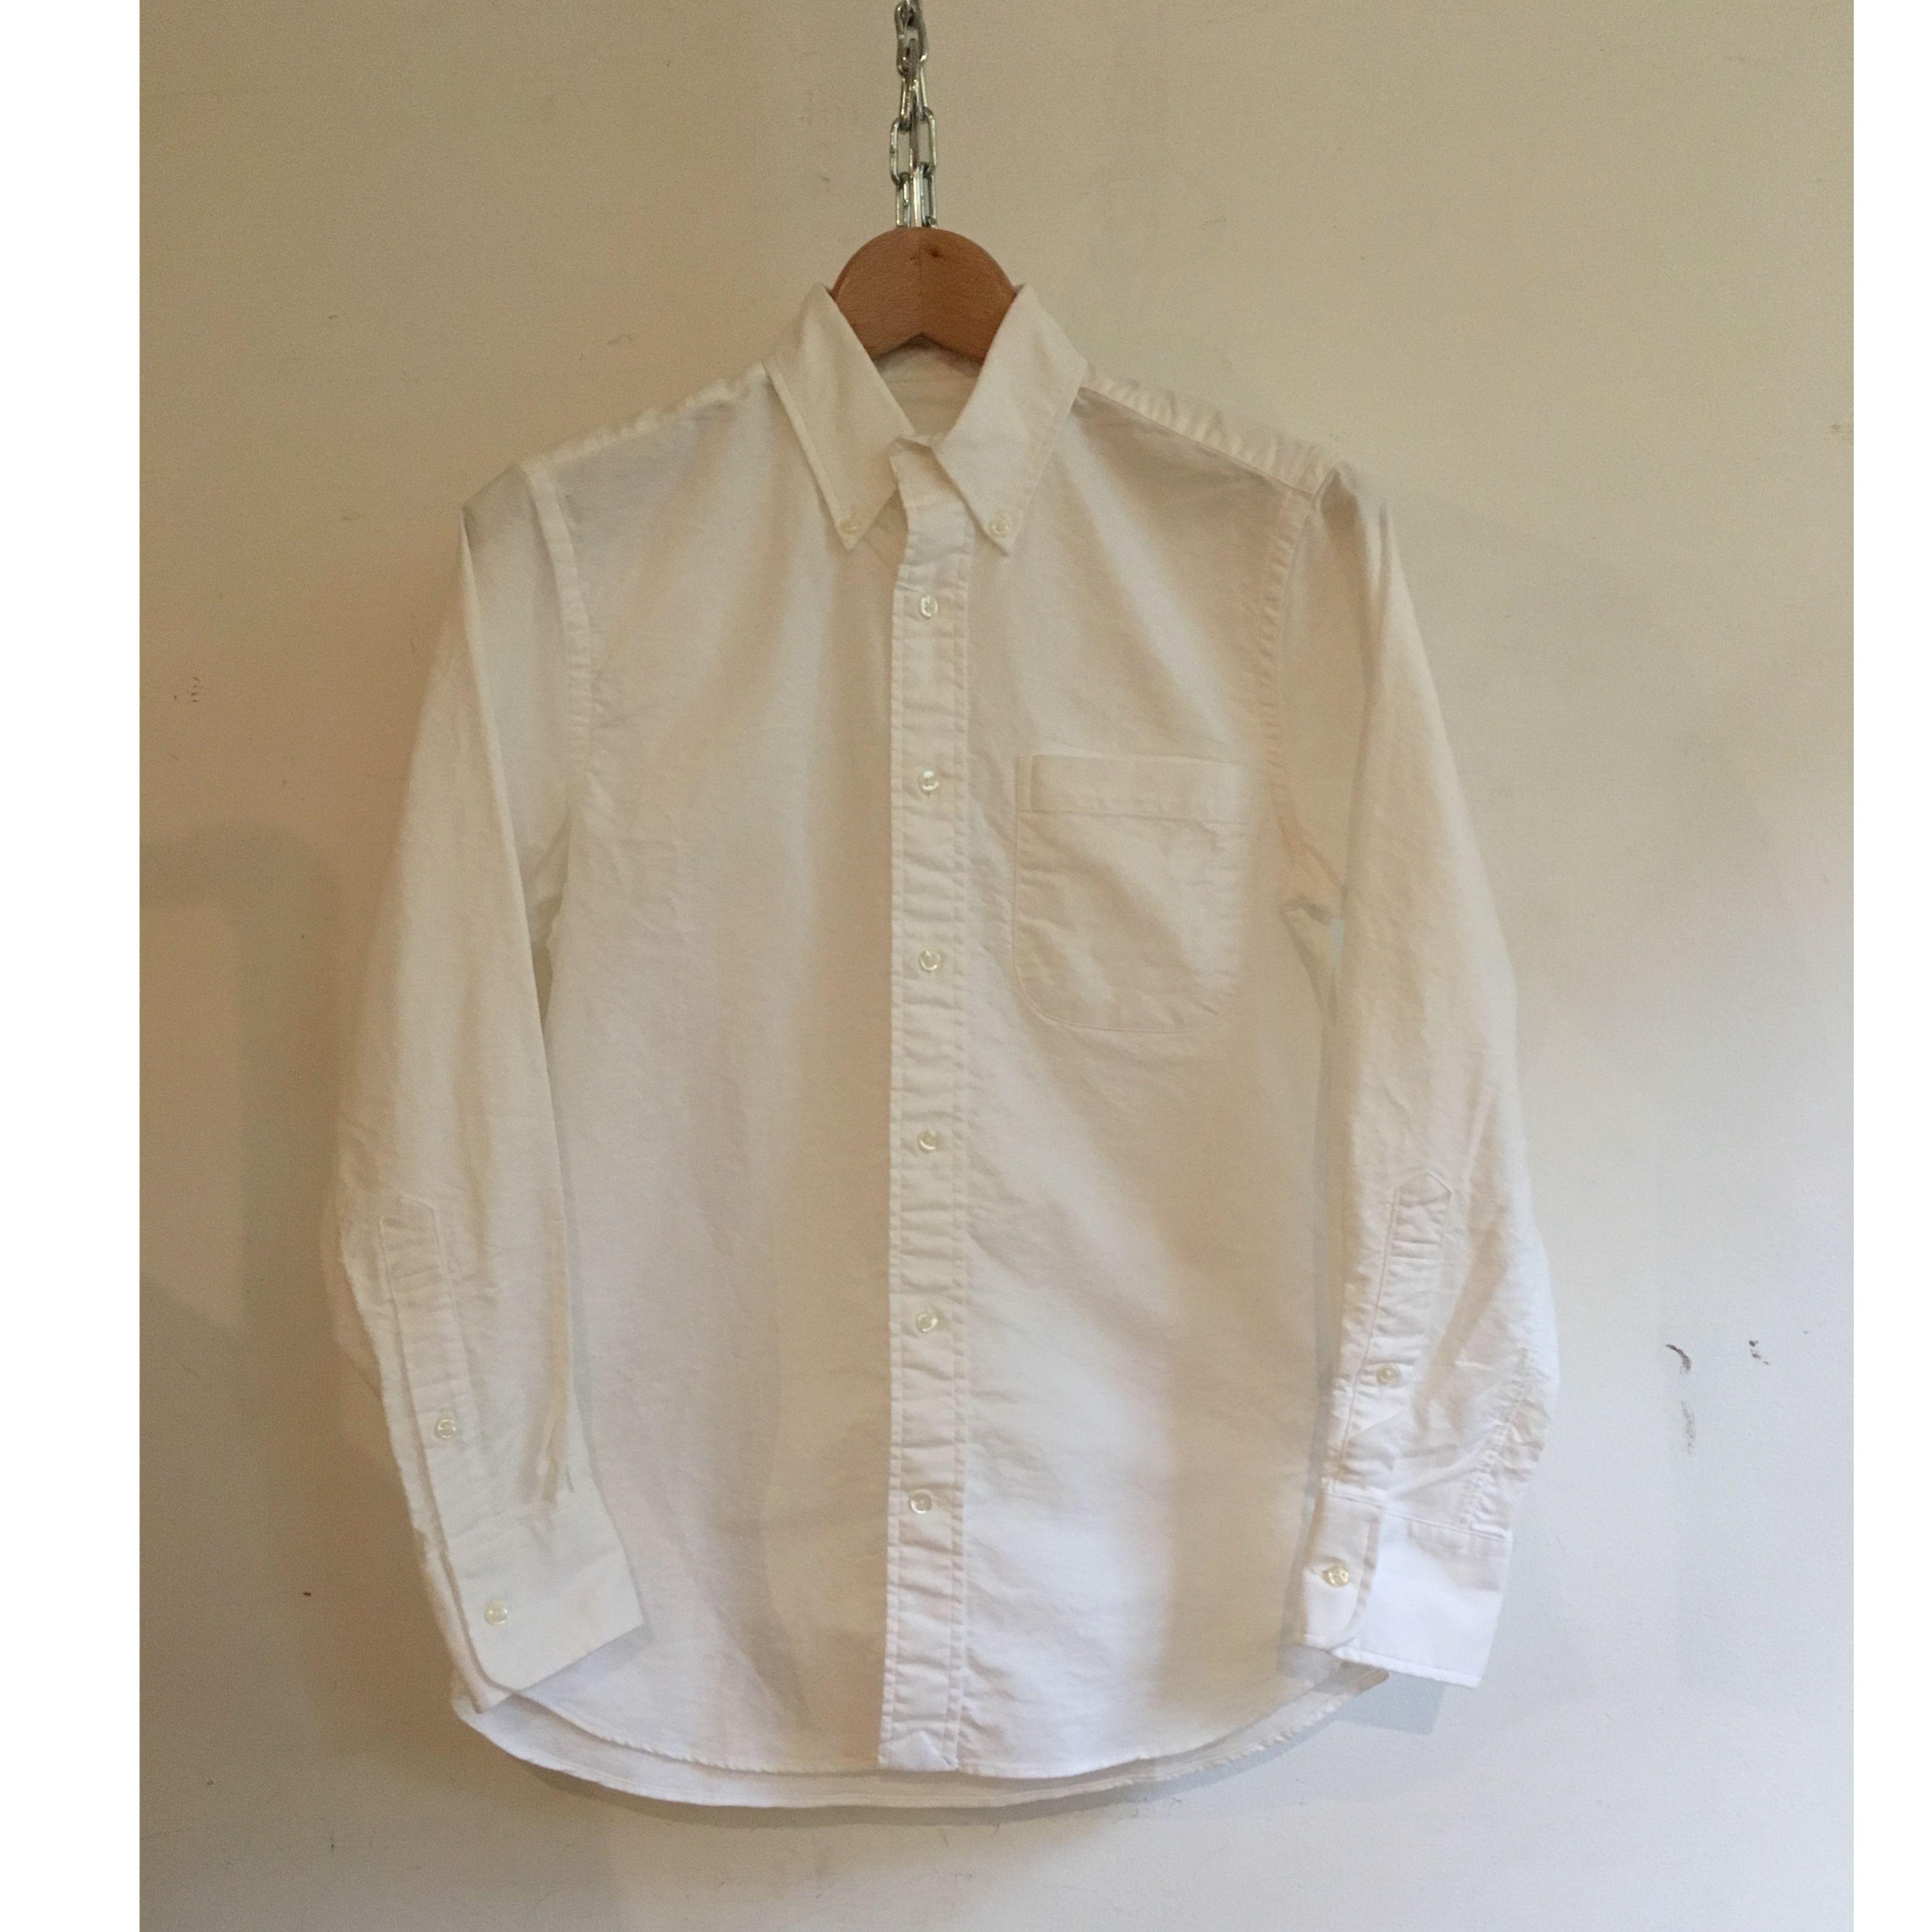 New England shirt company Oxford White Shirt